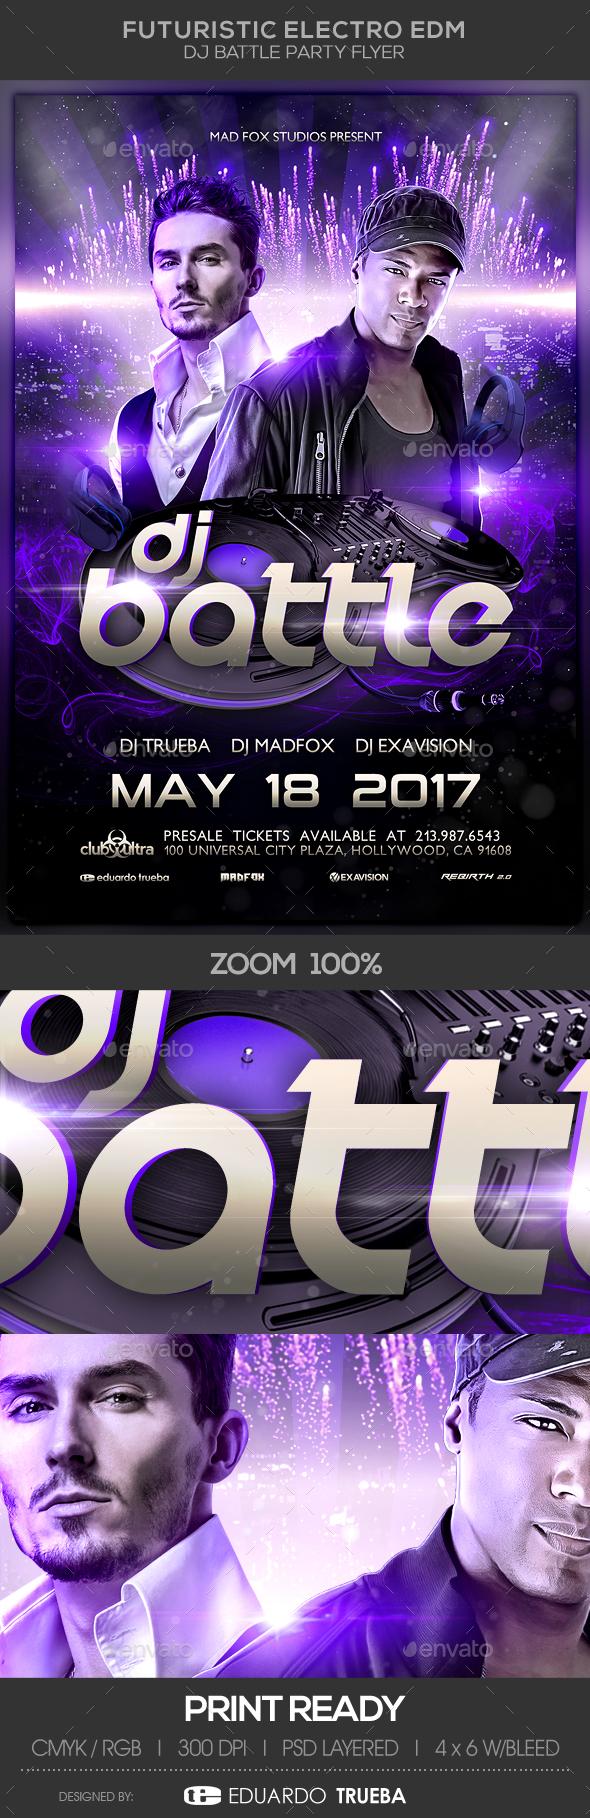 Futuristic Electro EDM Dj Battle Party Flyer - Clubs & Parties Events